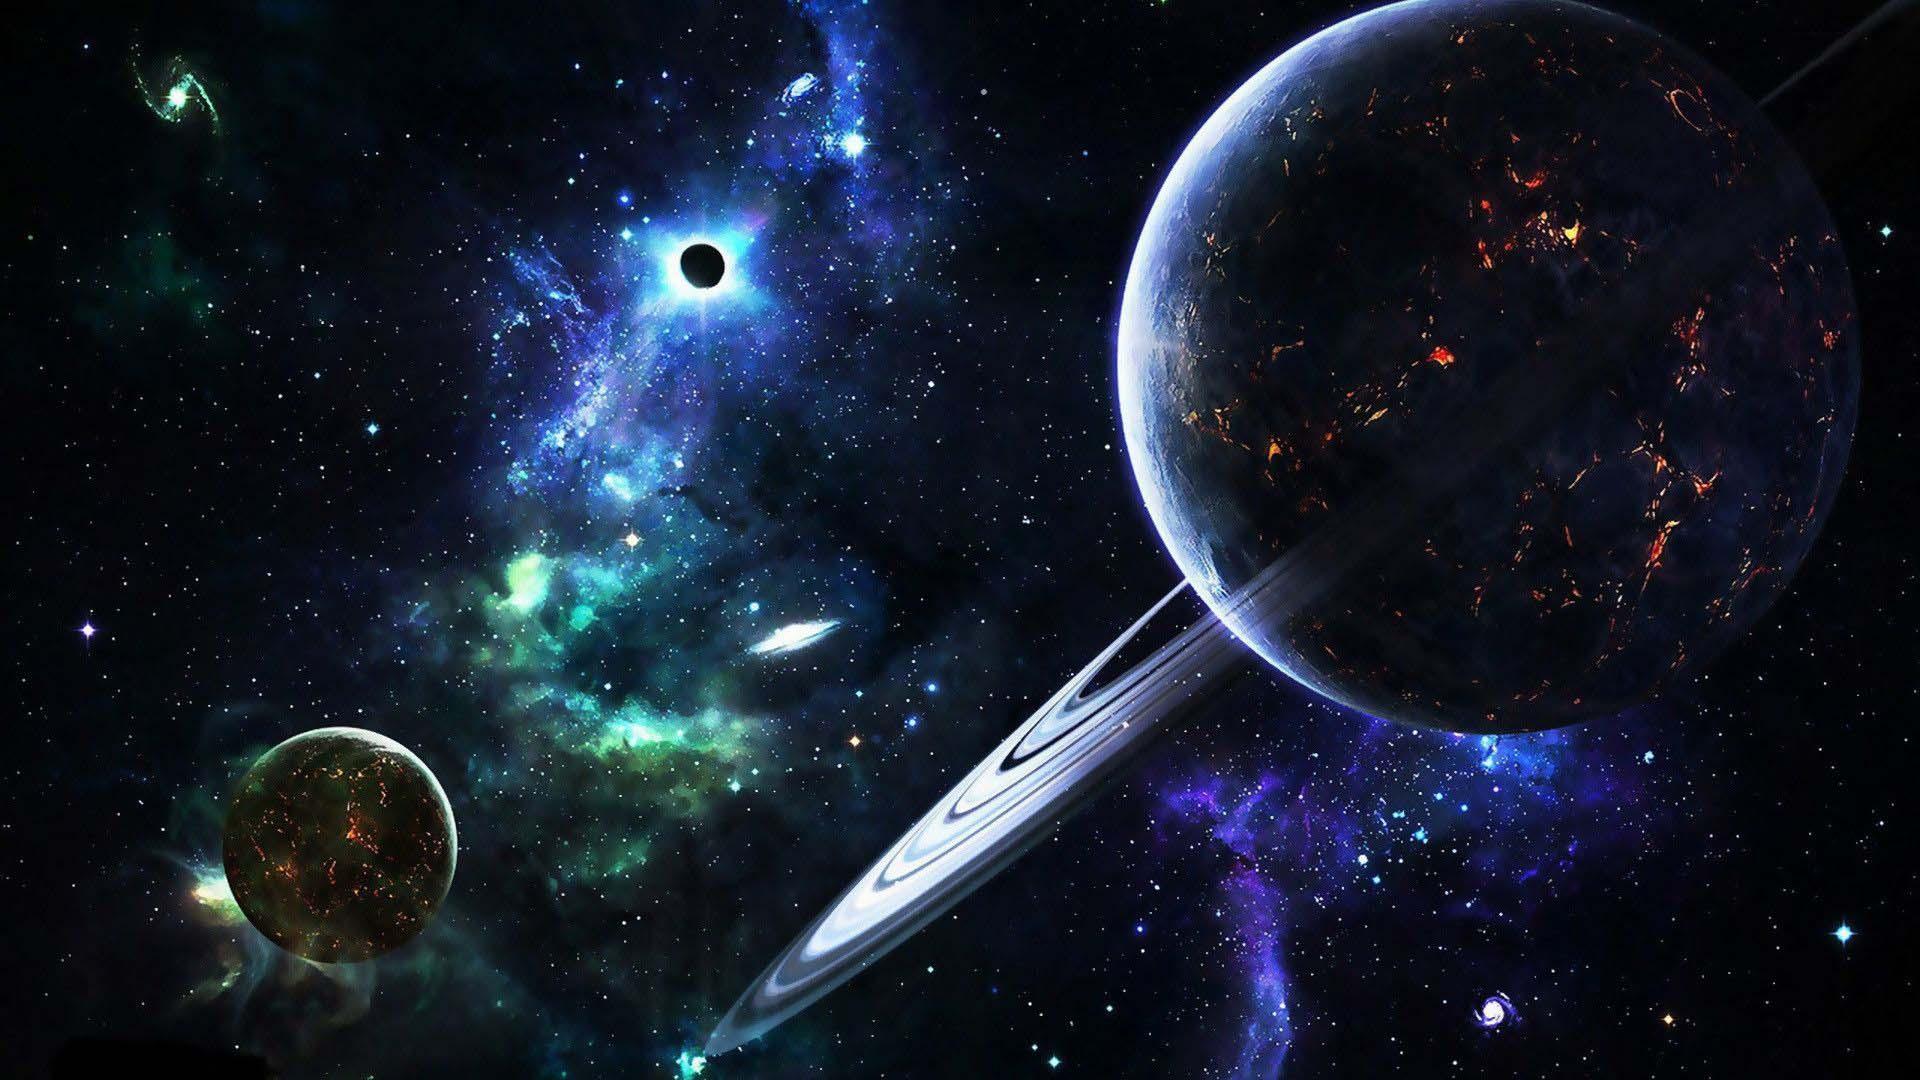 Galaxy planet wallpaper hd